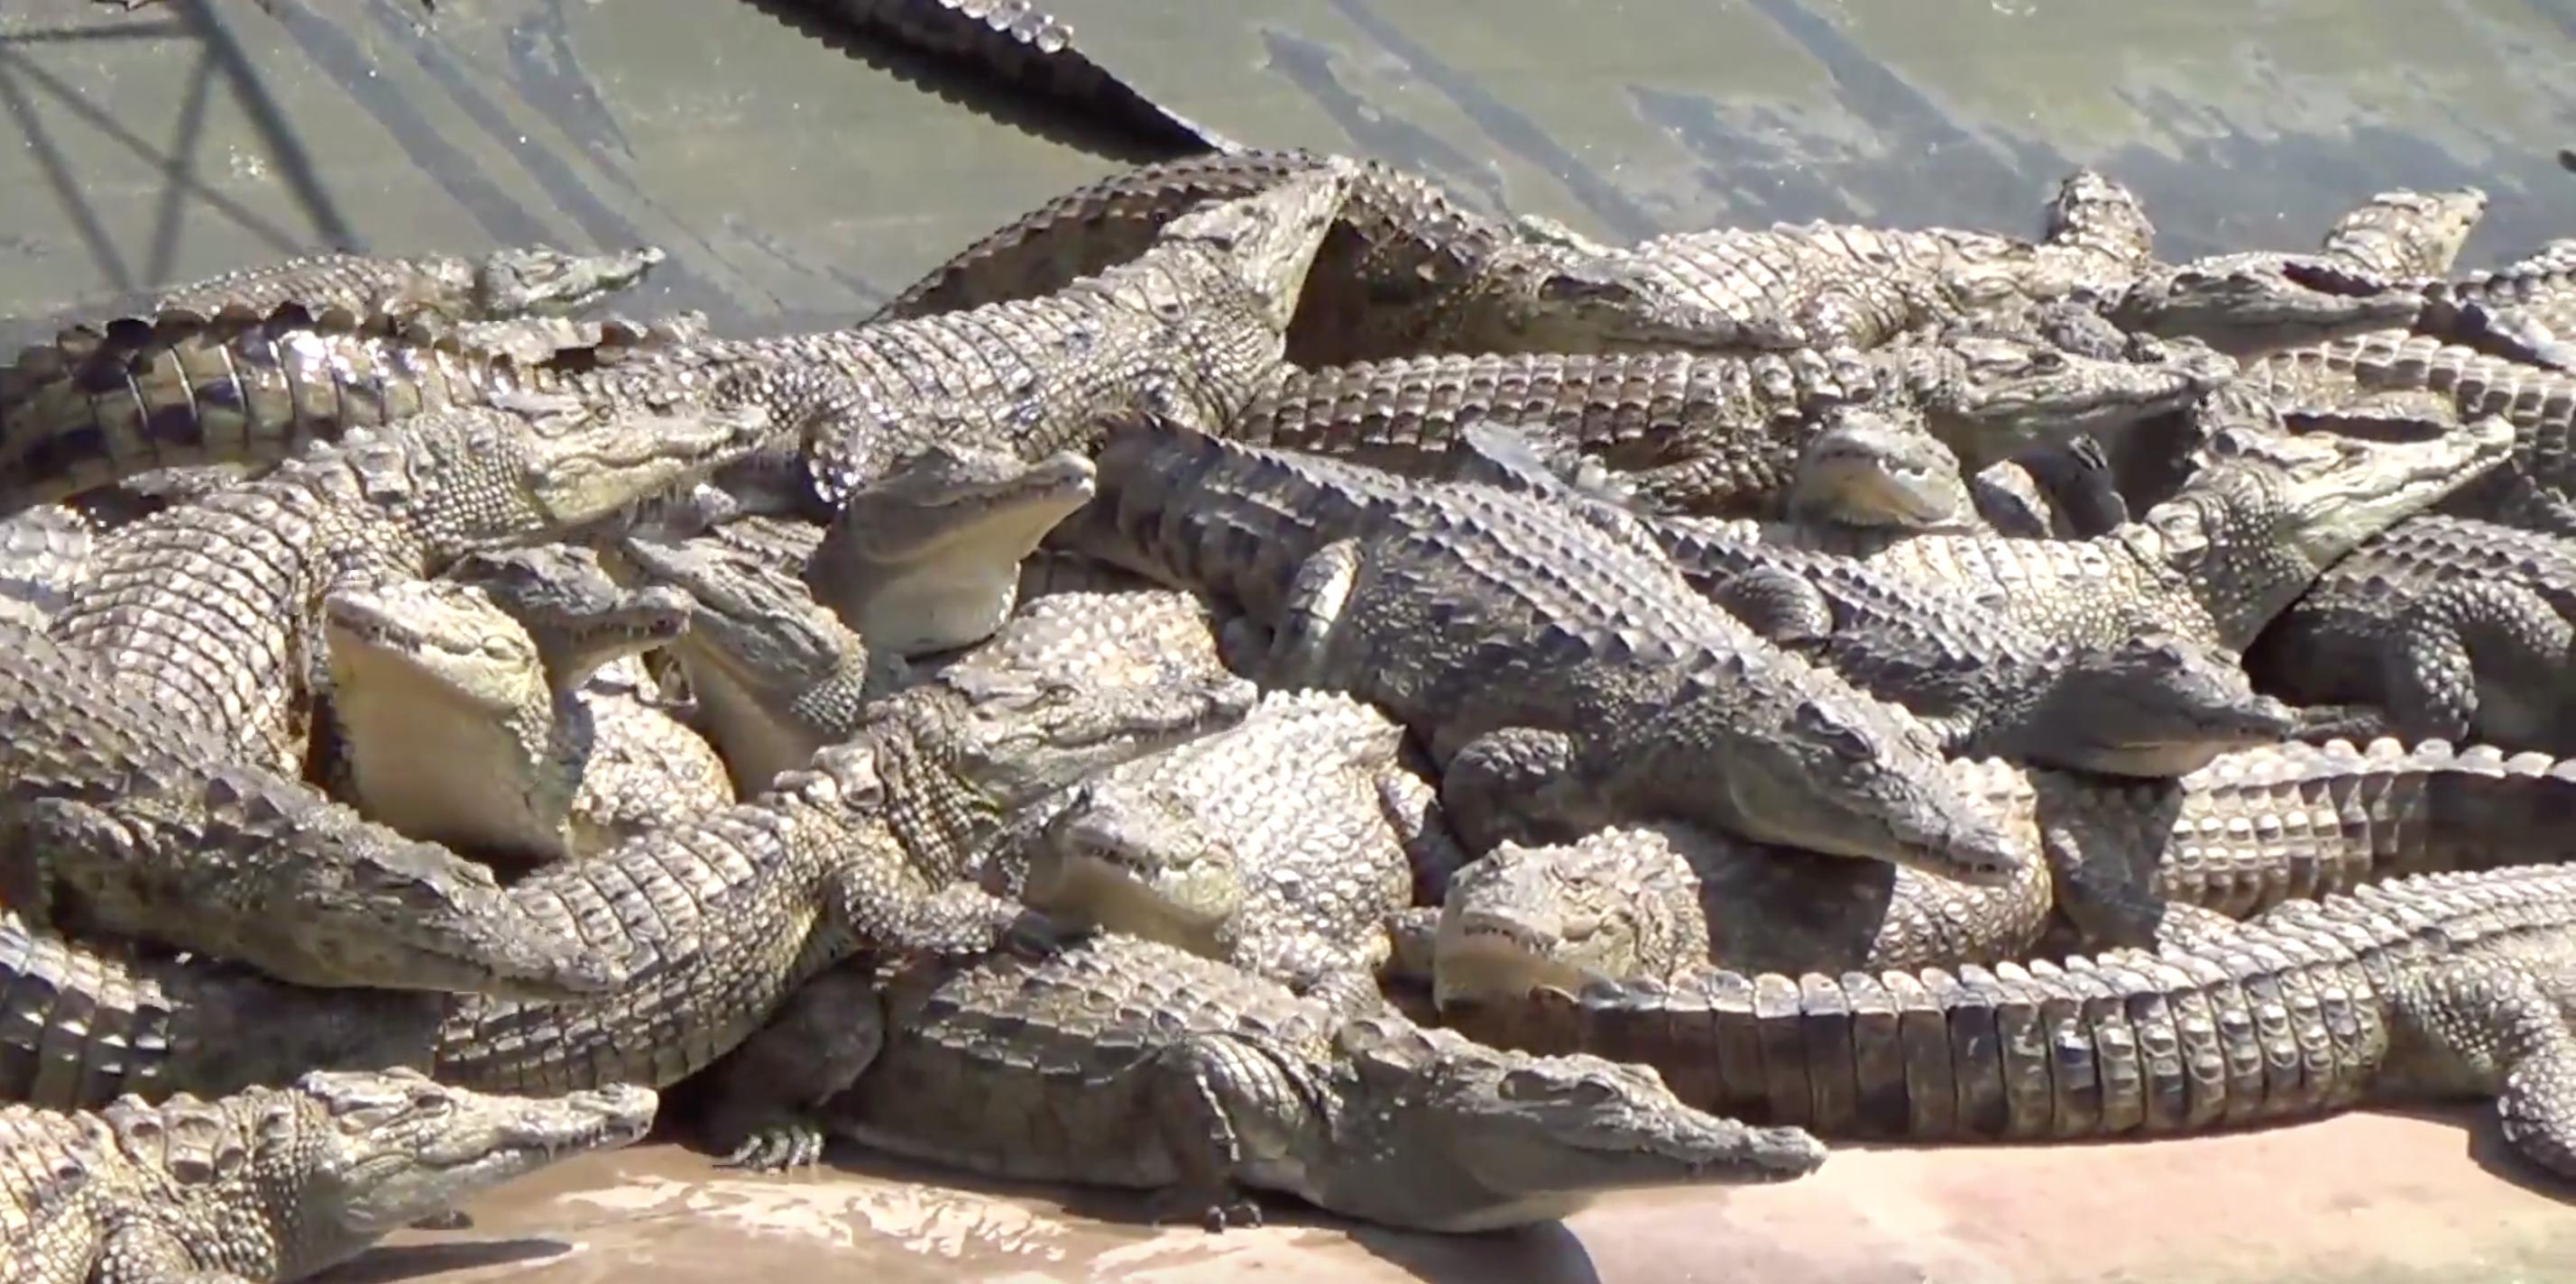 Undercover Investigators Expose Atrocities On Alligator Farms That Supply Retailer Herm 232 S